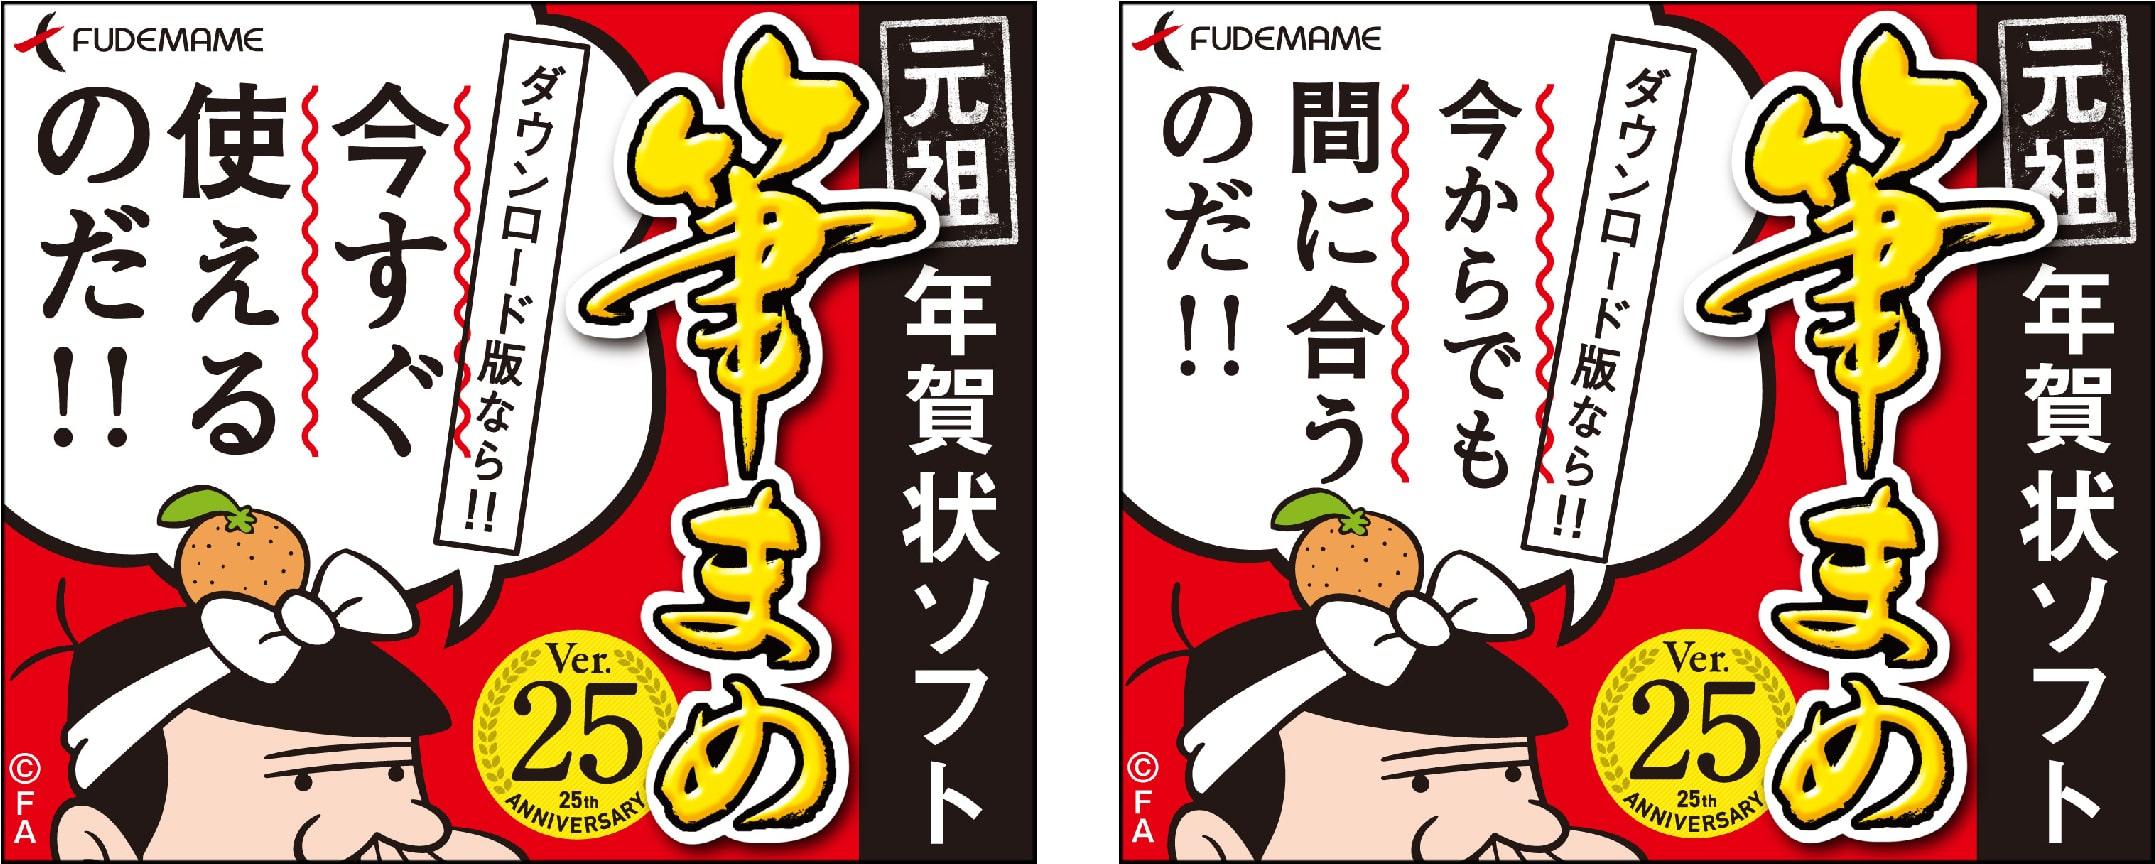 FUDEMAME-広告デザイン